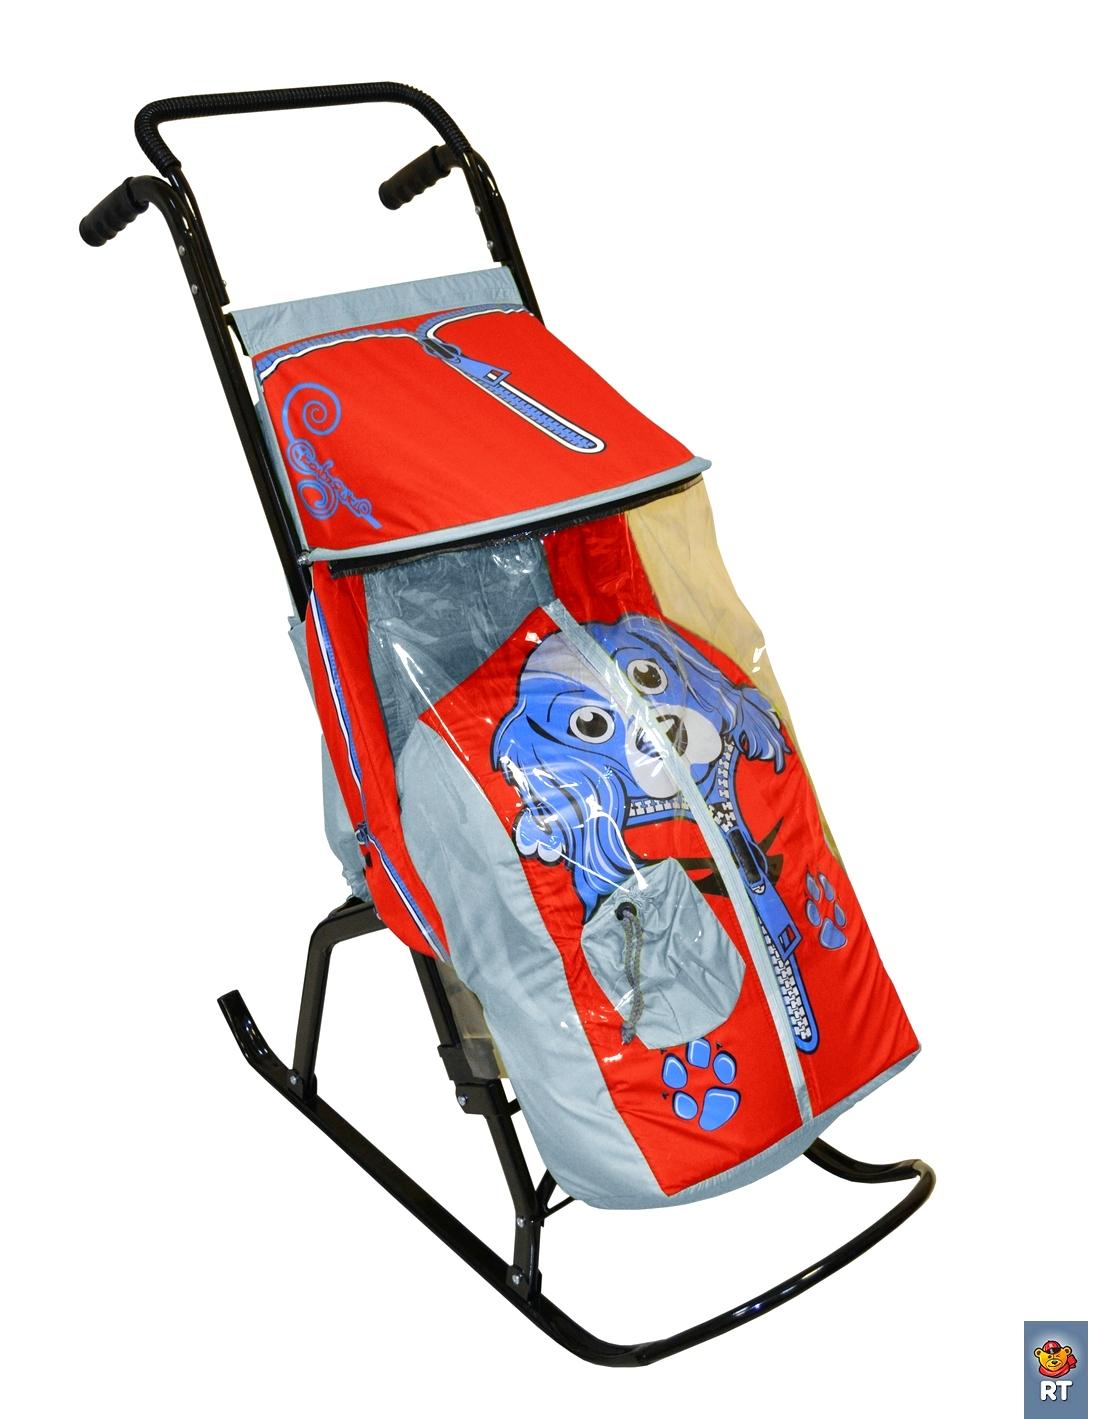 Санки-коляска Снегурочка 2-Р Собачка, цвет – серый, красныйСанки и сани-коляски<br>Санки-коляска Снегурочка 2-Р Собачка, цвет – серый, красный<br>